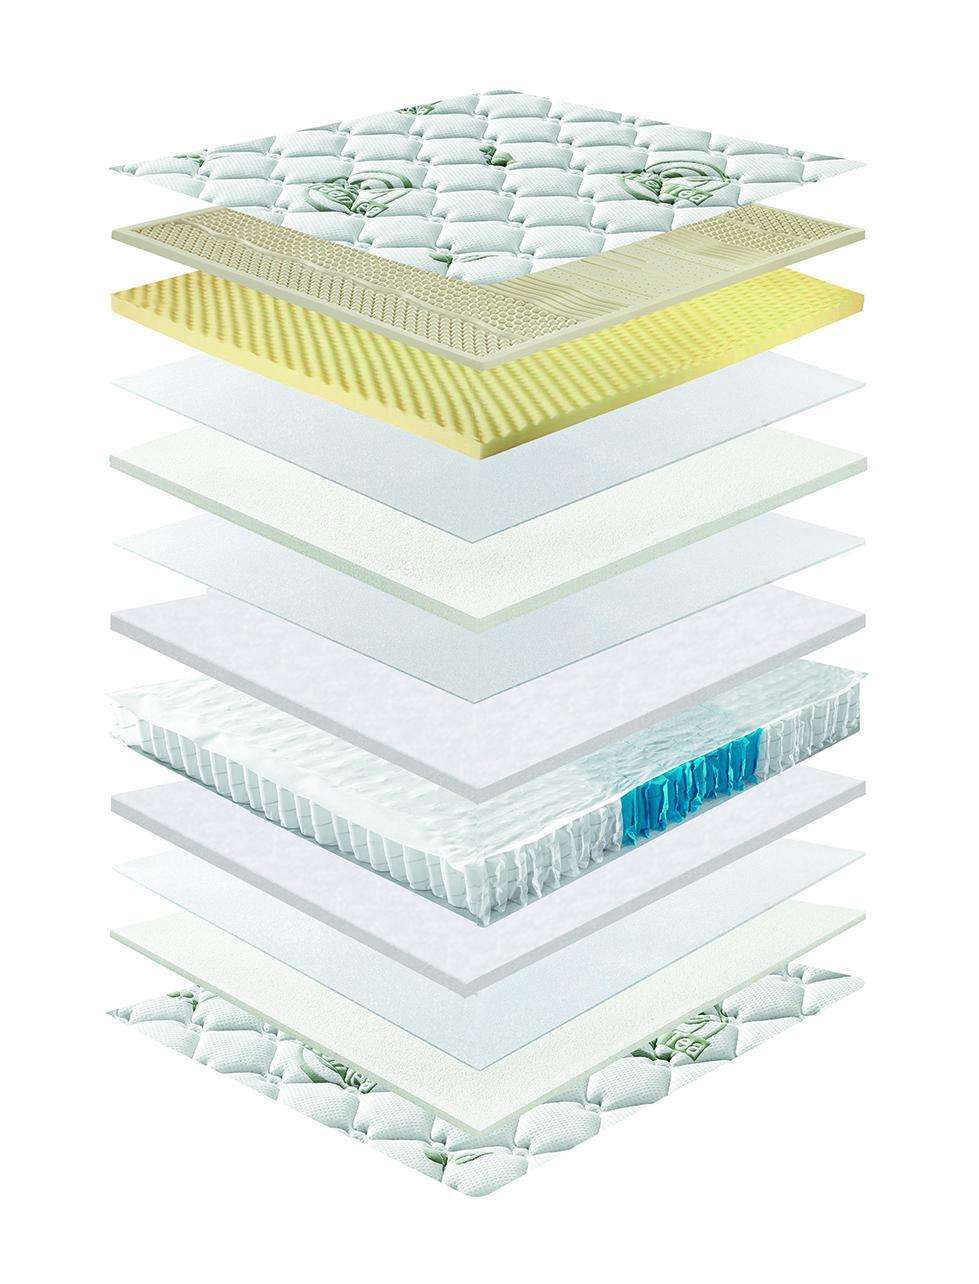 pocket spring latex mattress green tea plant knitted fabric compression mattress 4